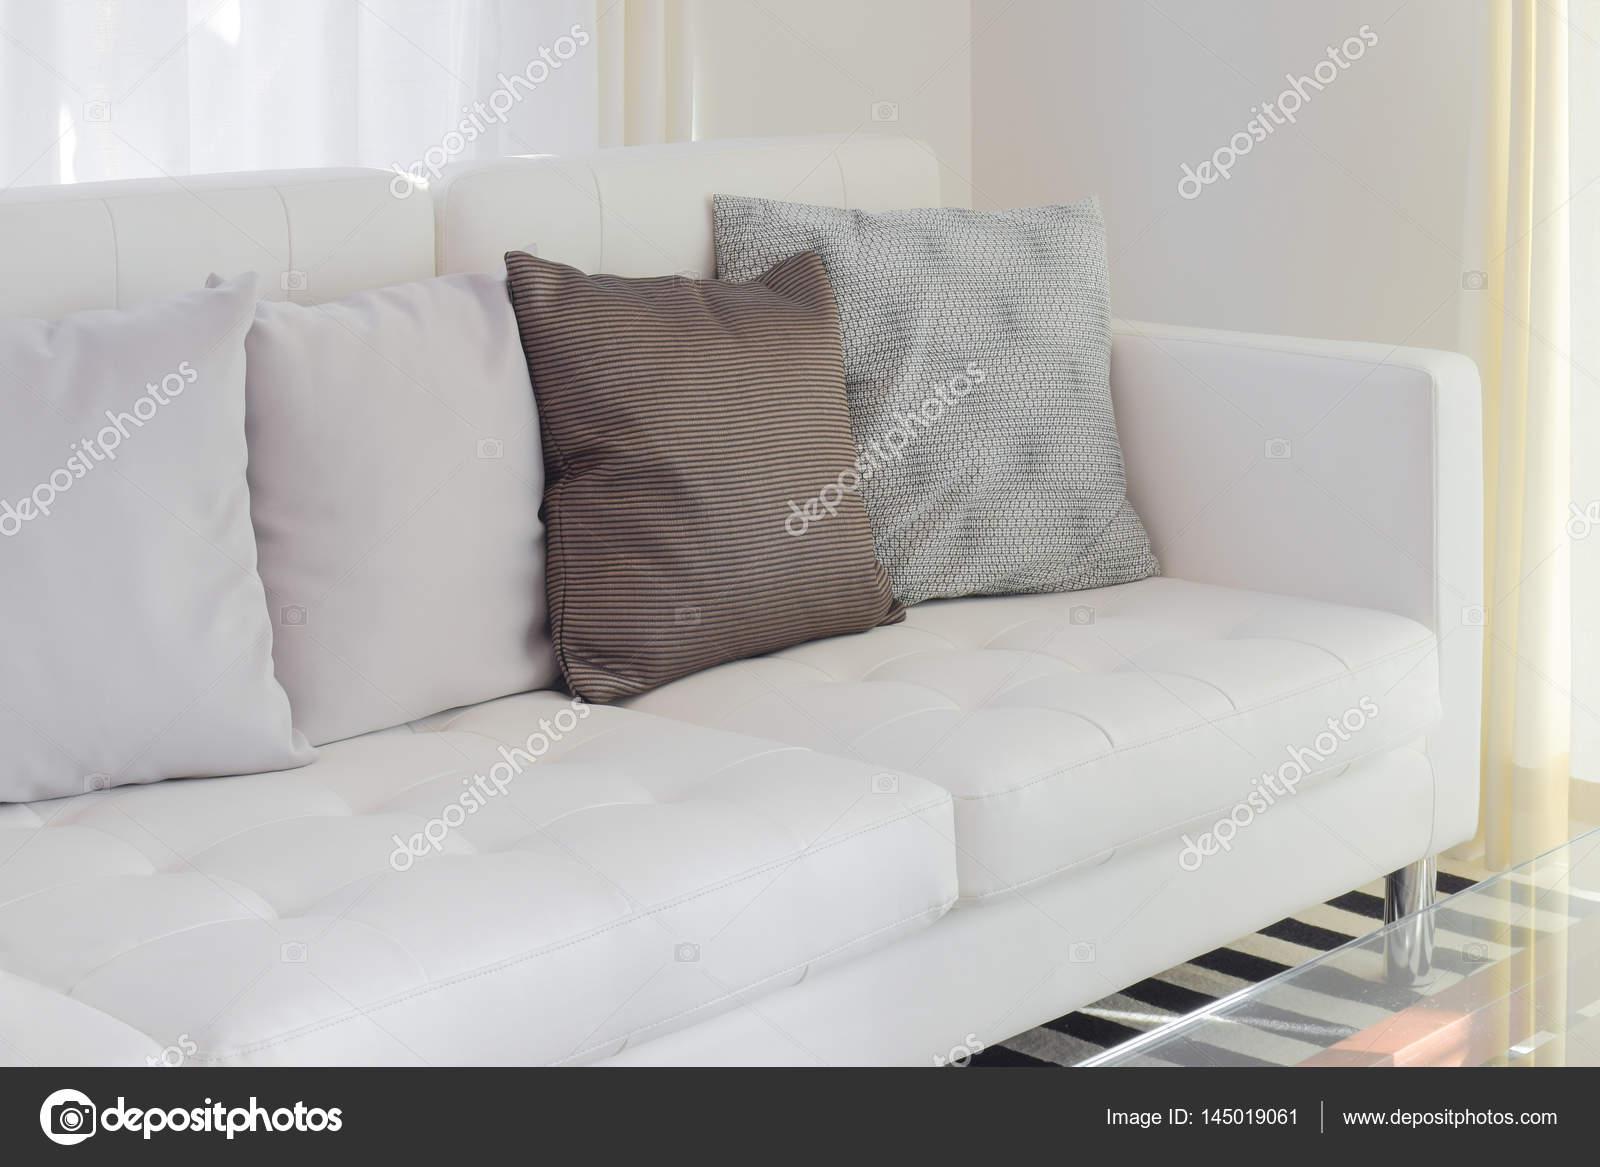 Kussens op witte sofa in de woonkamer — Stockfoto © WorldWide_Stock ...